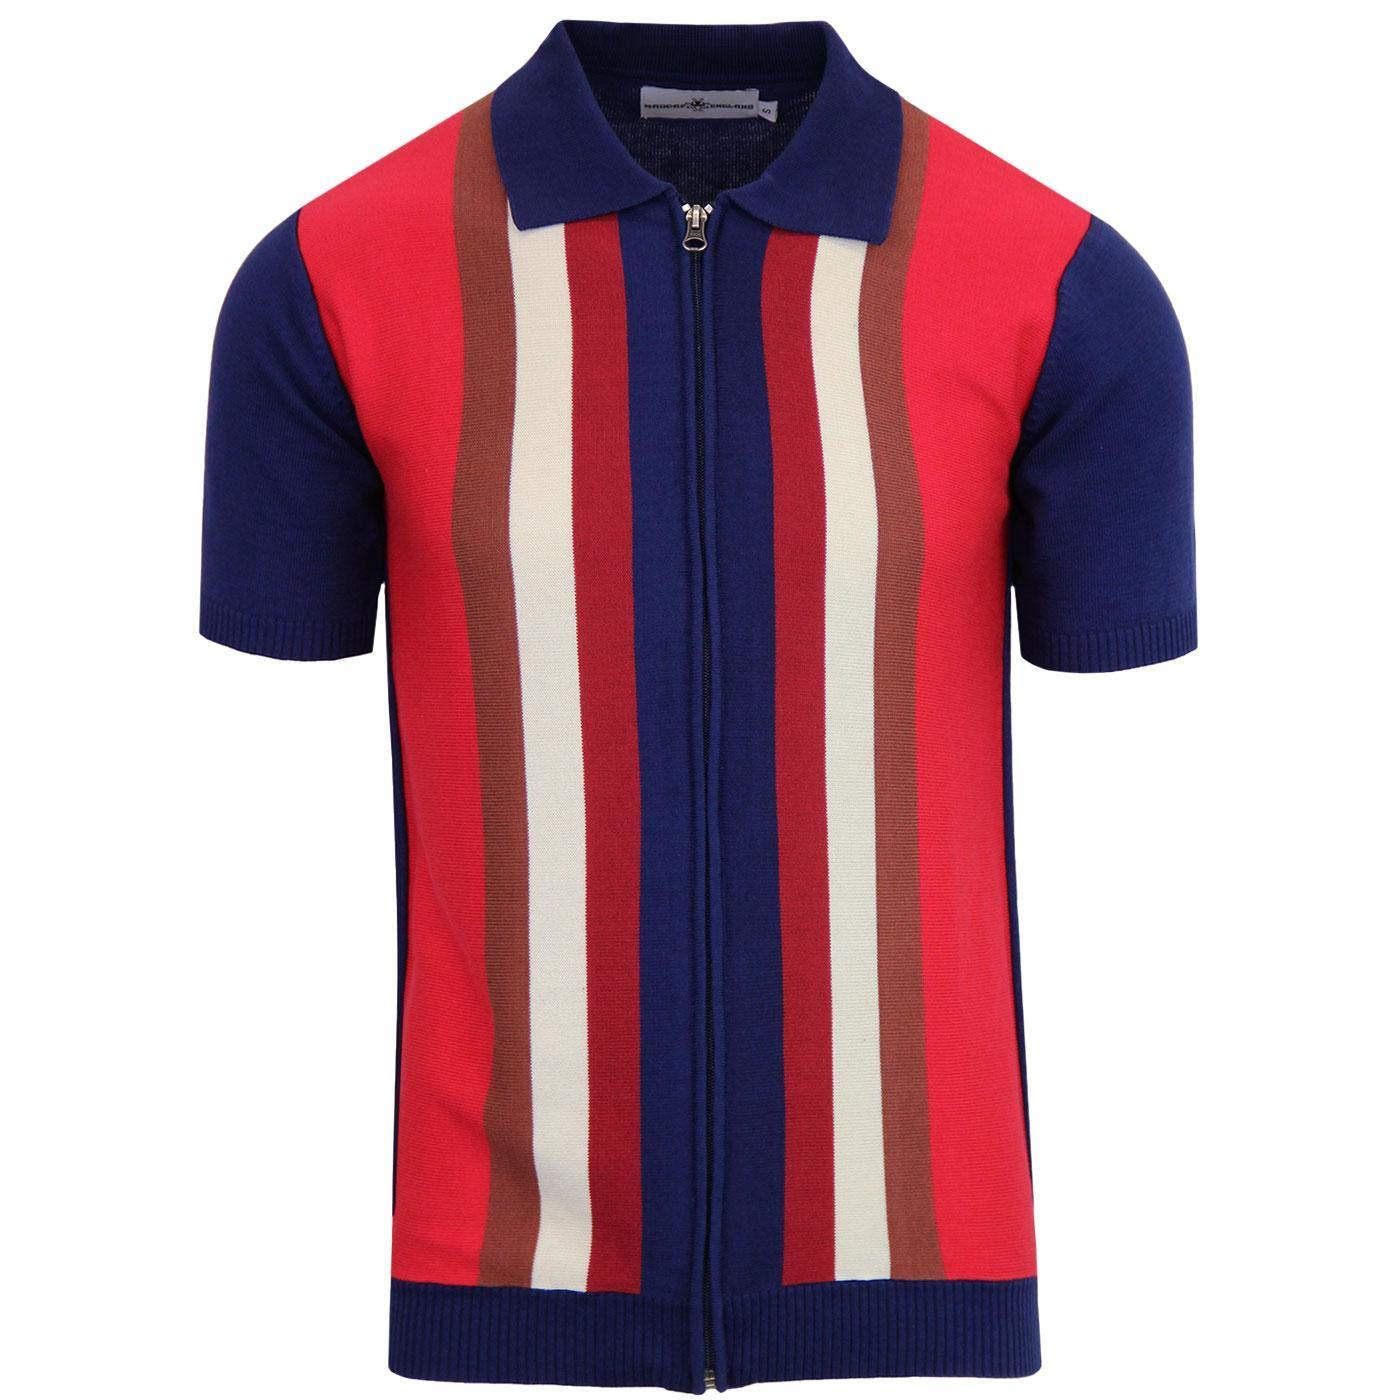 Vintage Shirts – Mens – Retro Shirts Madcap England Mens Retro 70s Victor Zip Through Polo Cardigan £39.99 AT vintagedancer.com